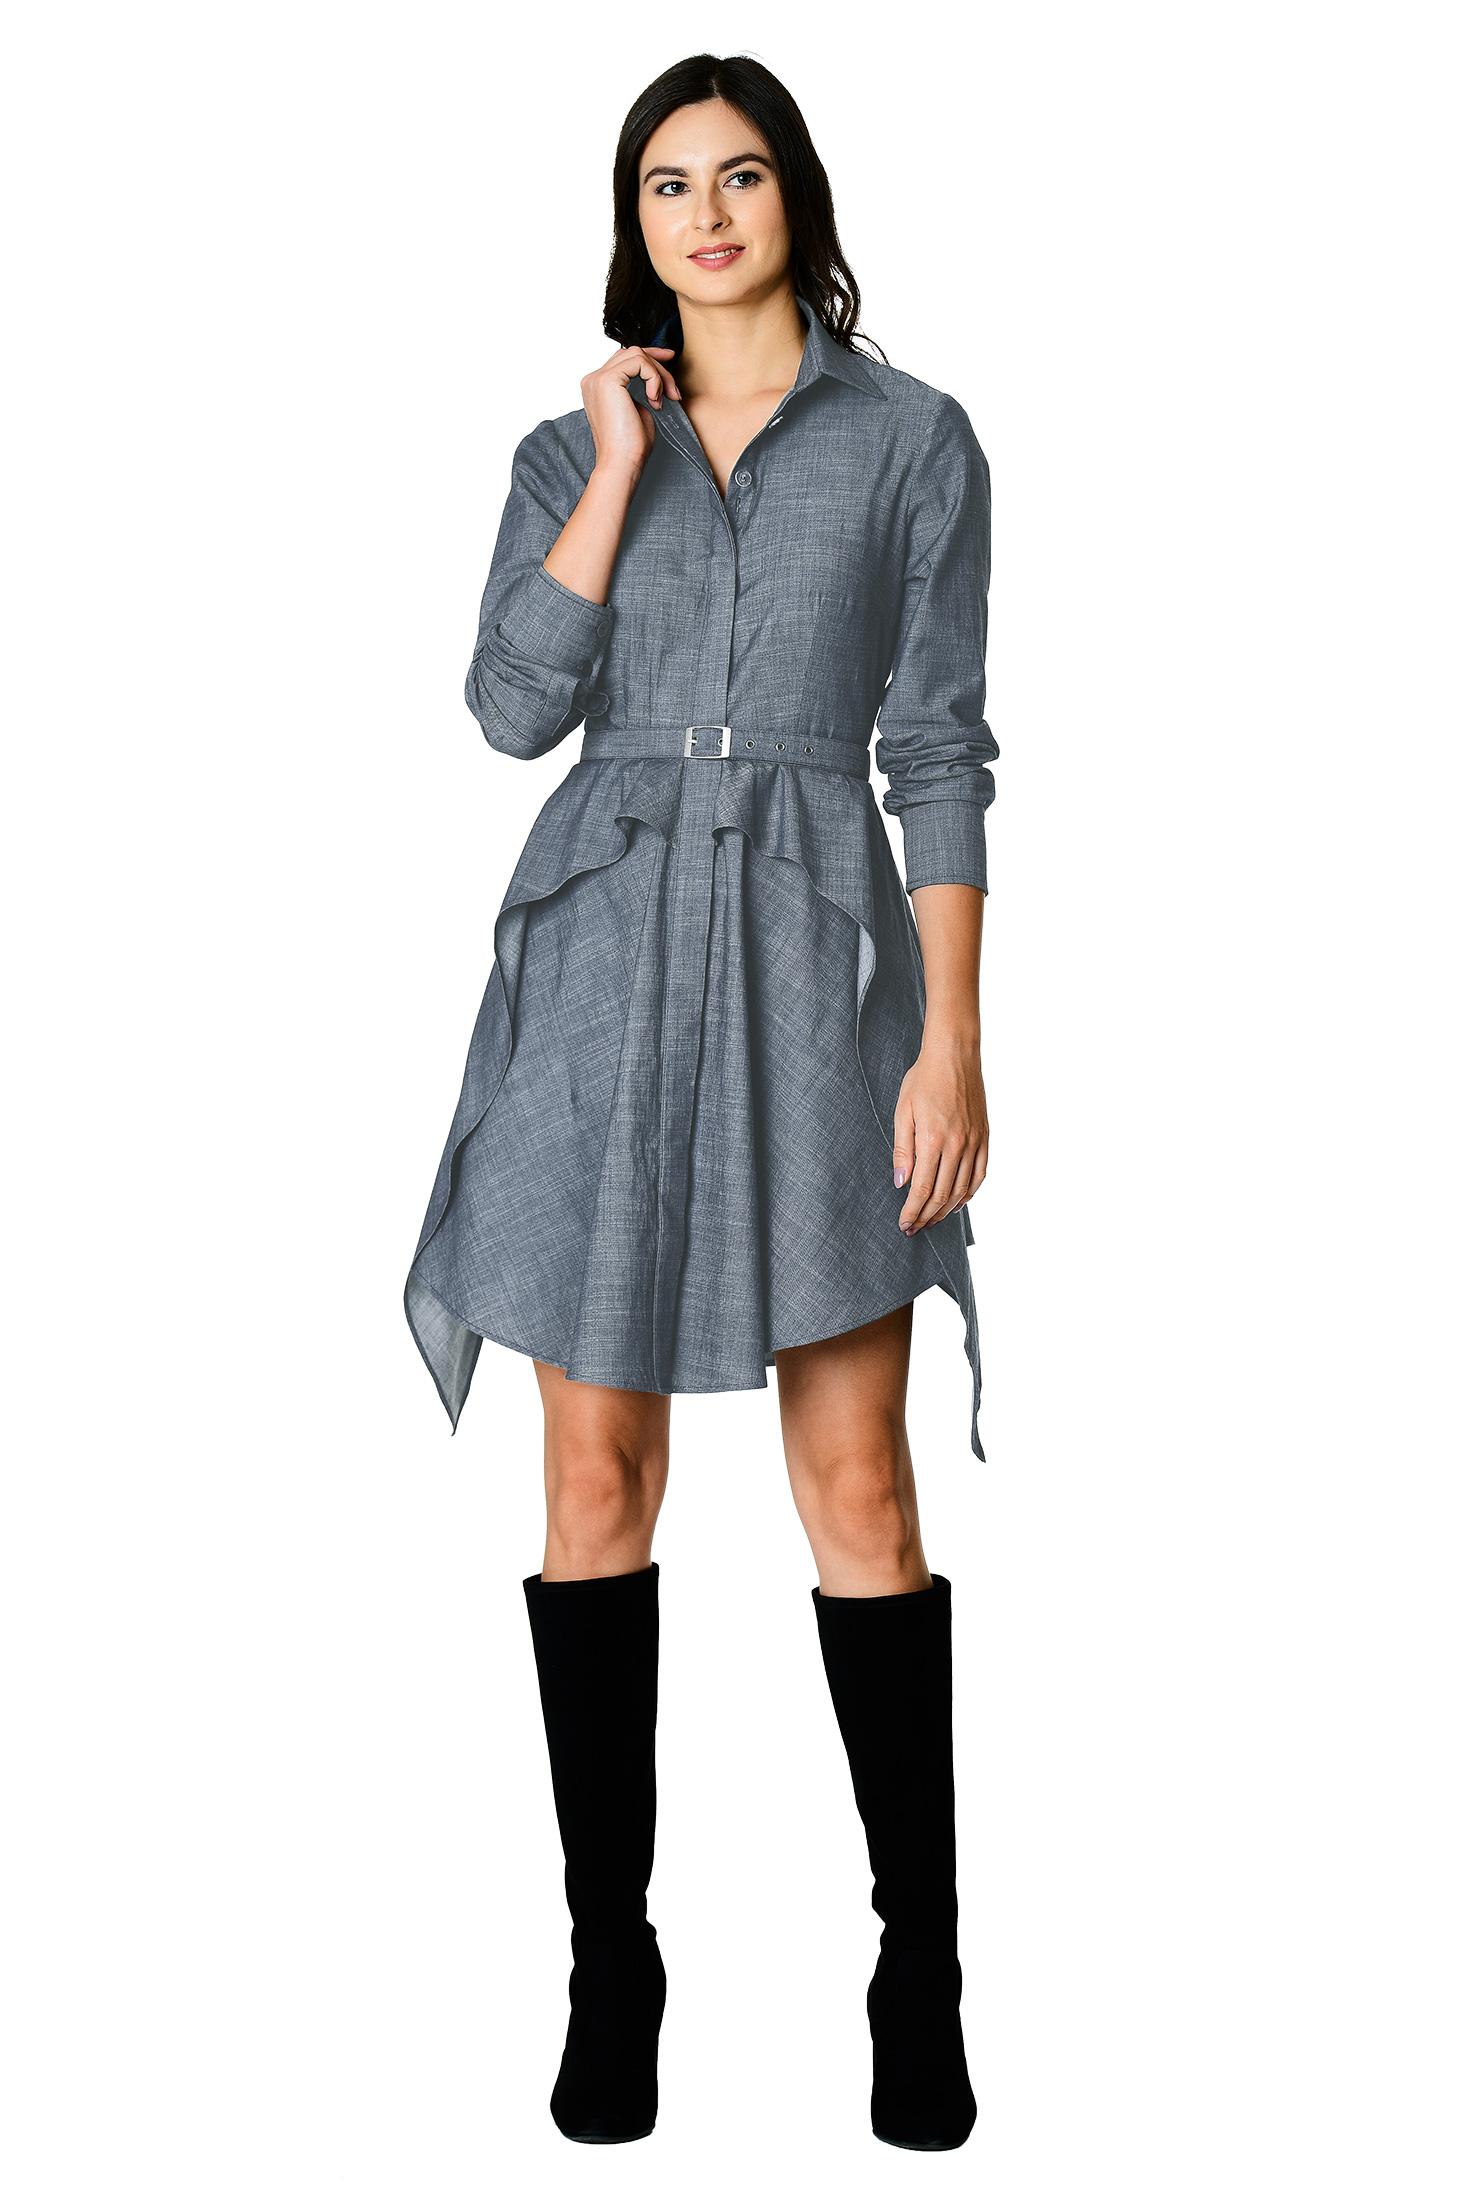 Womens Fashion Clothing 0 36w And Custom